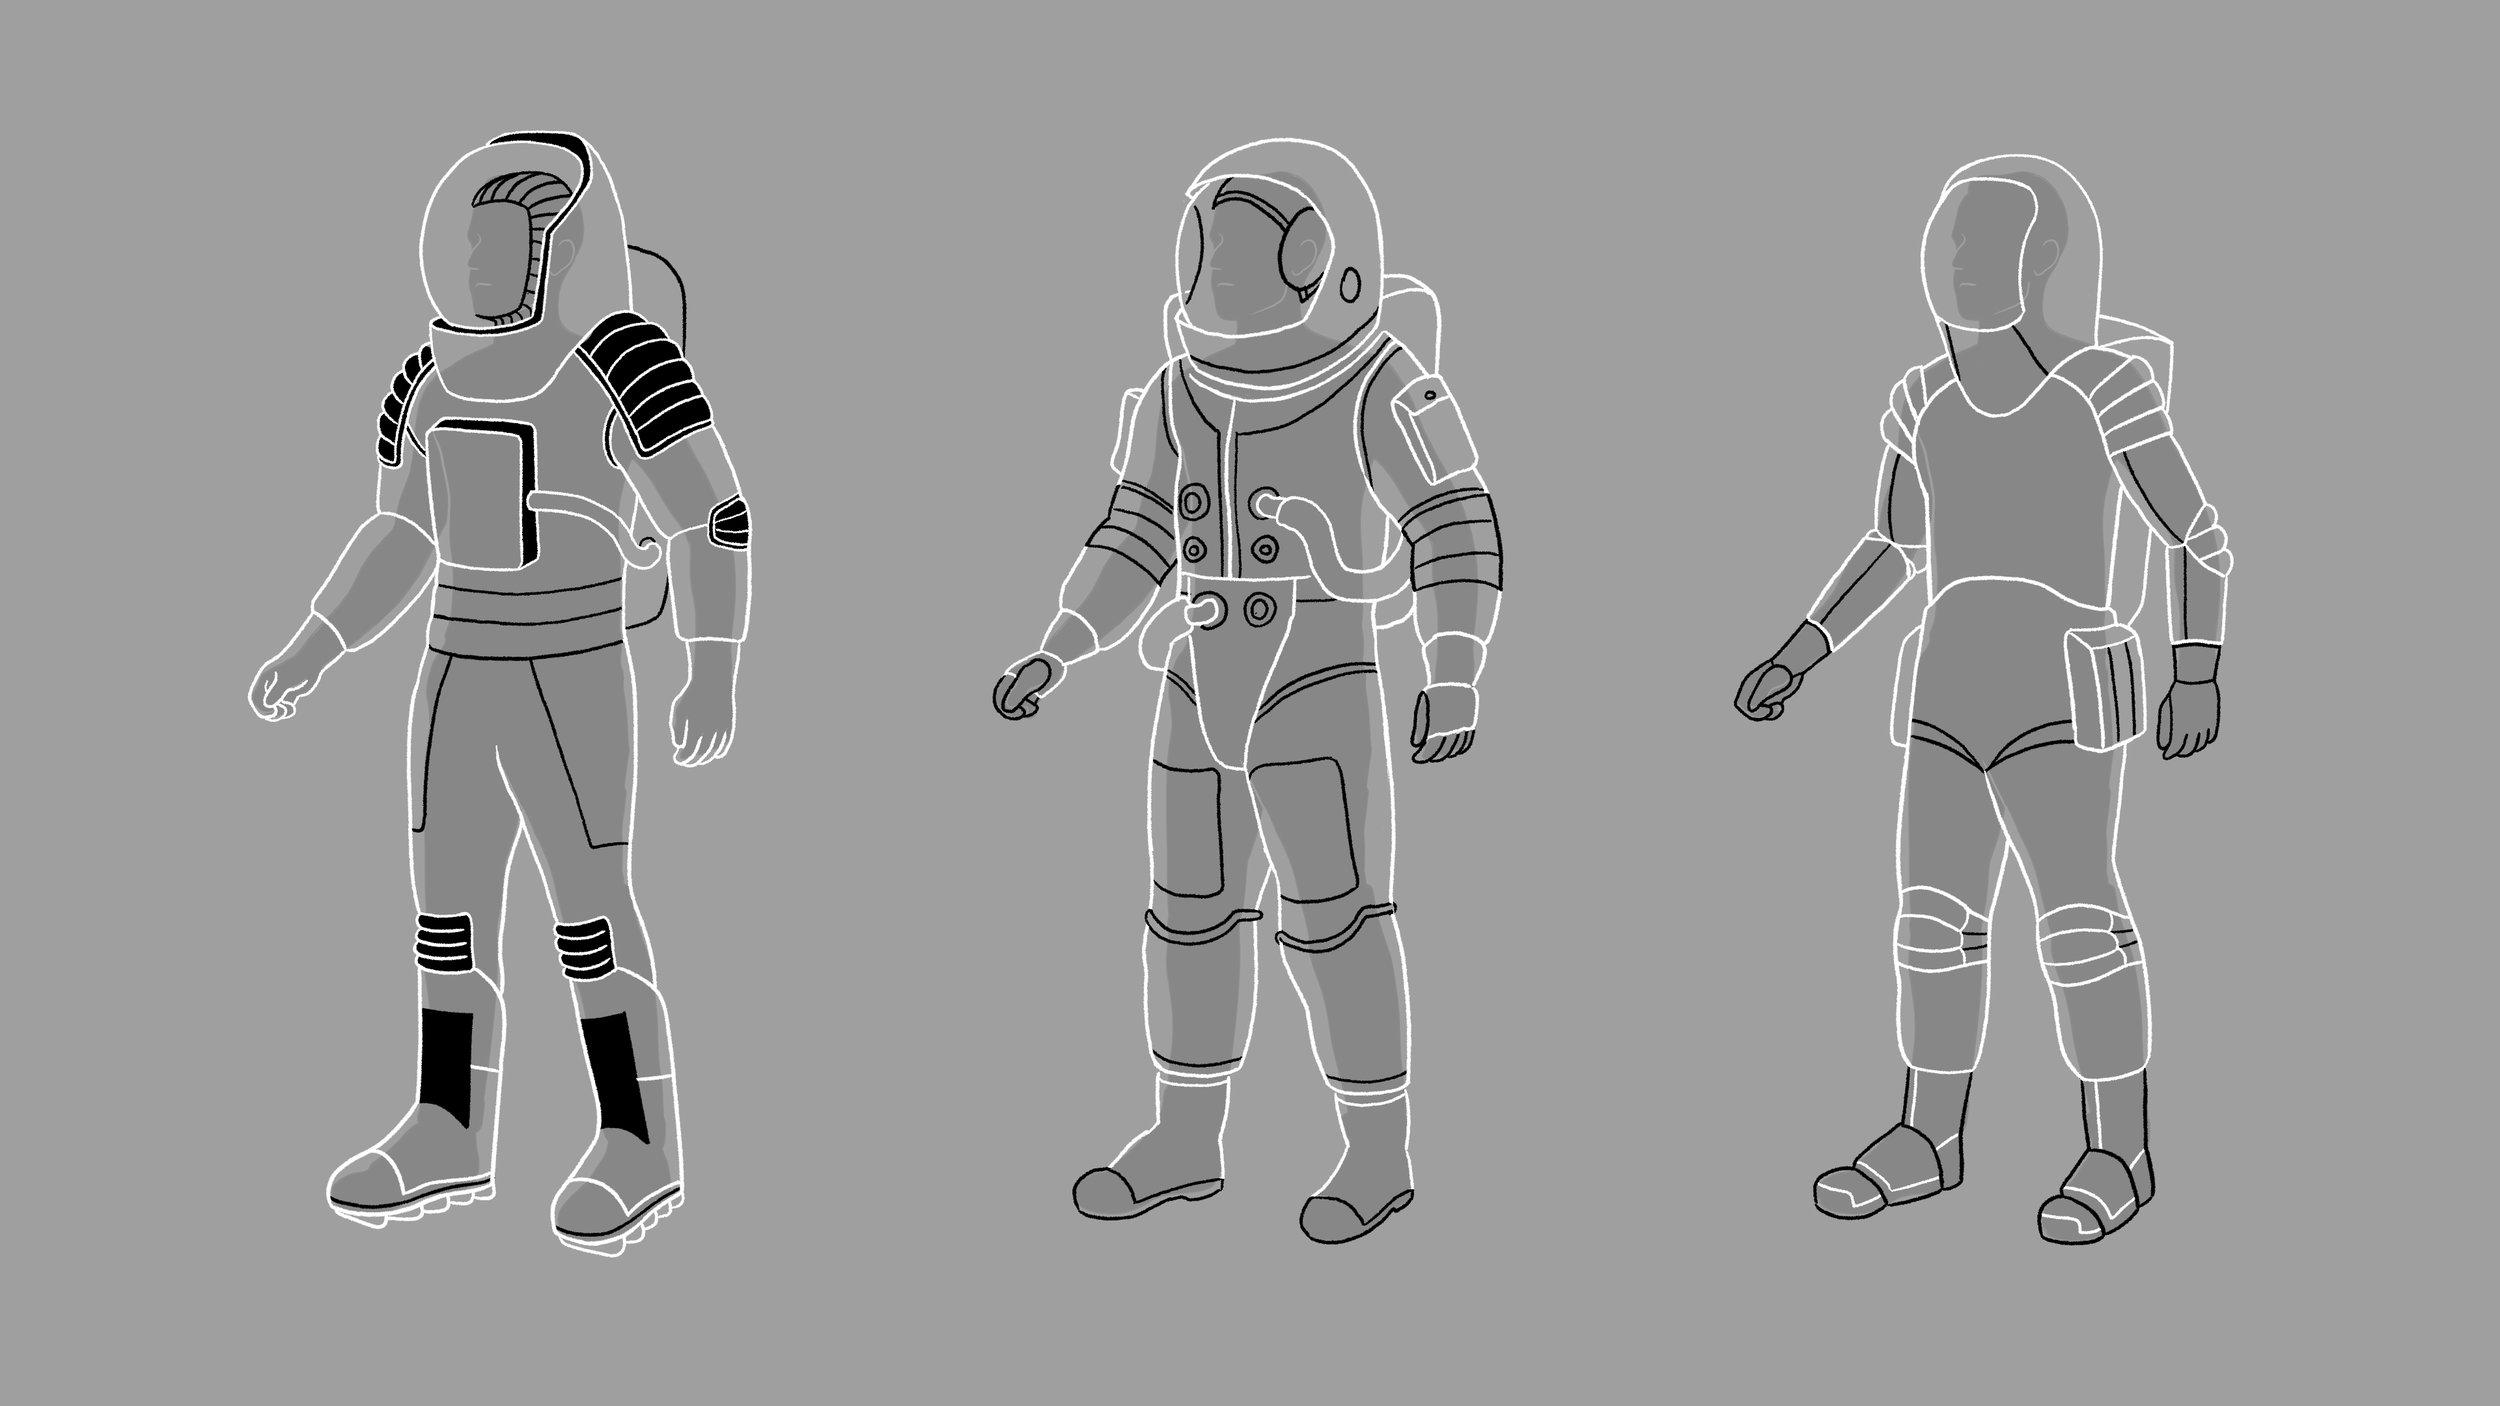 Oreo_Kid_Inside_Astronautrs_004.jpg